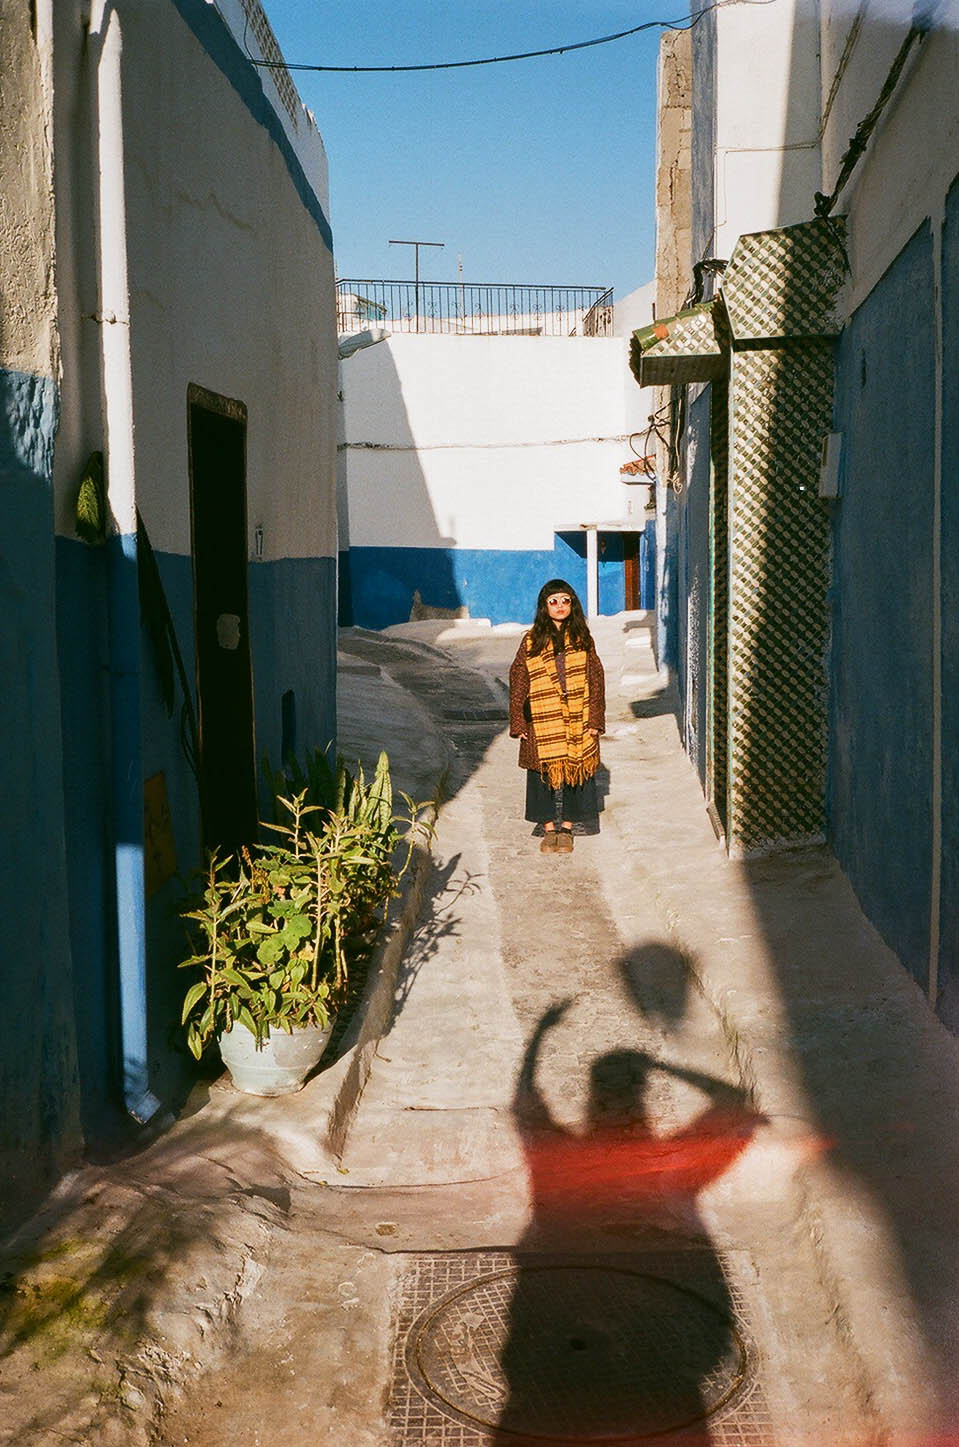 Morocco_Helen_Västrik_-6.jpg